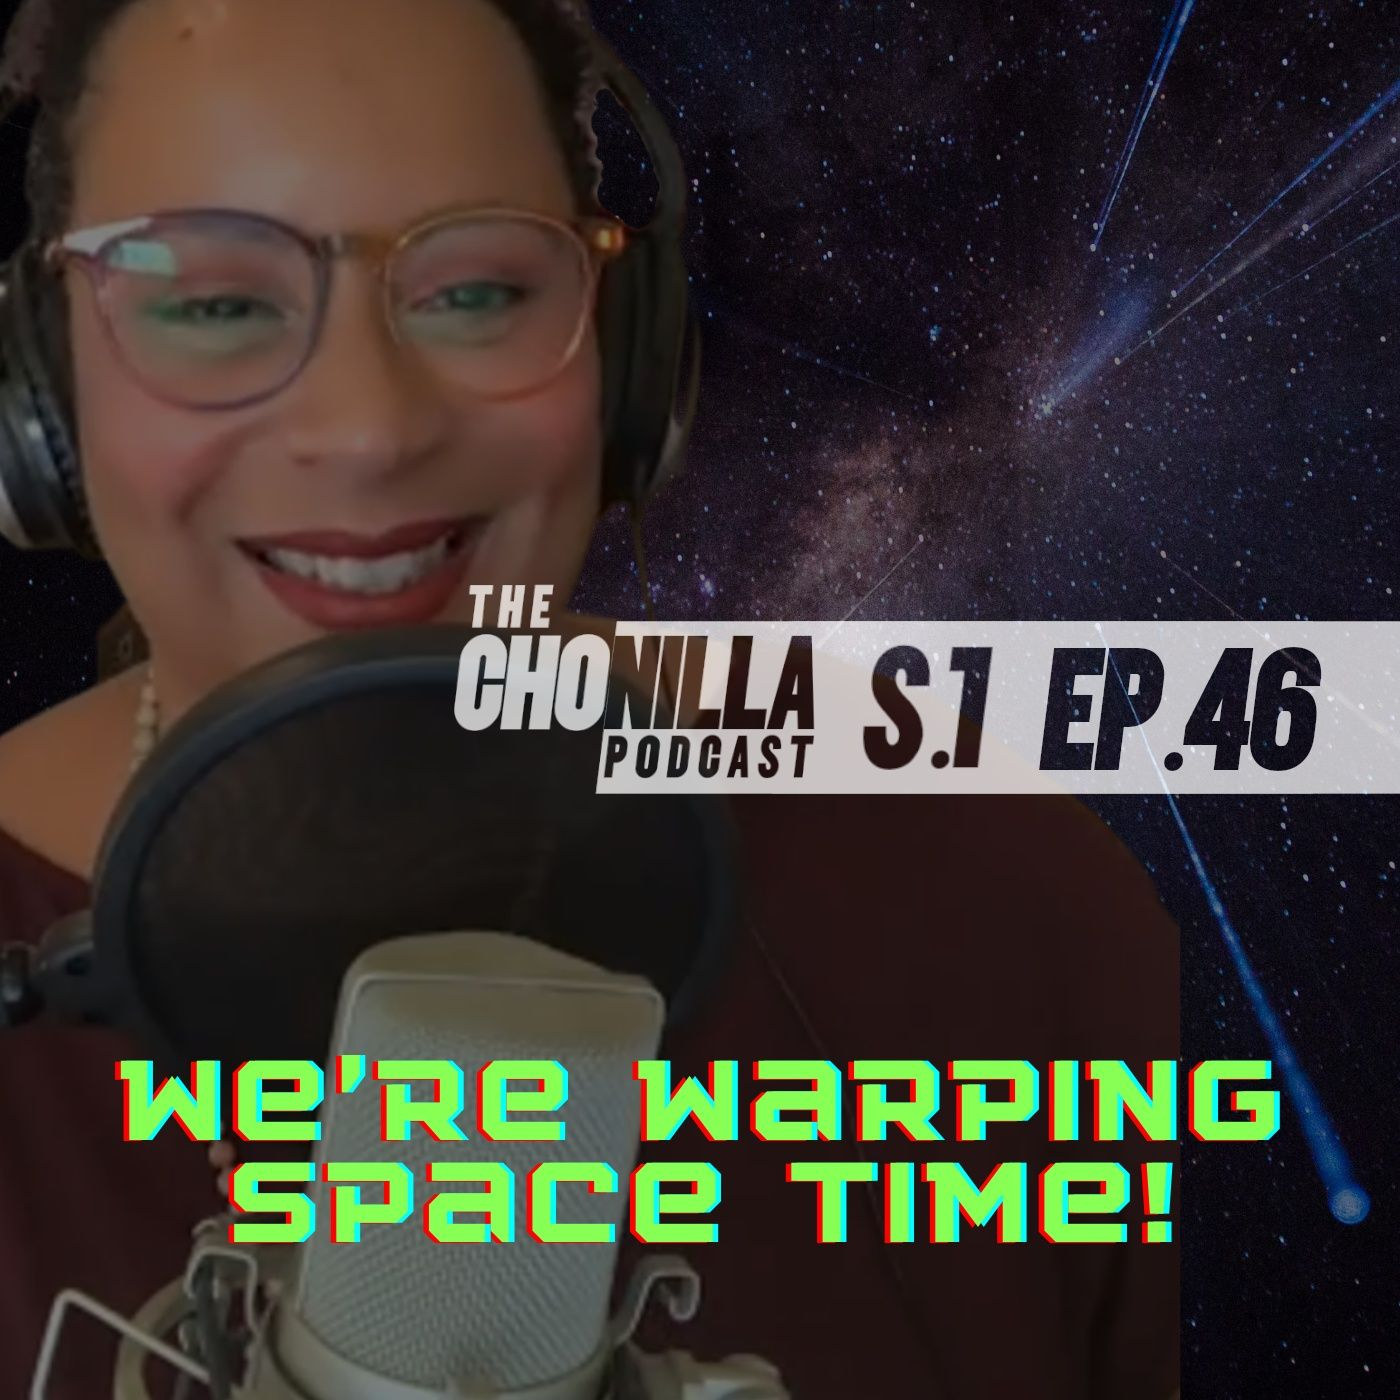 We're warping space-time!